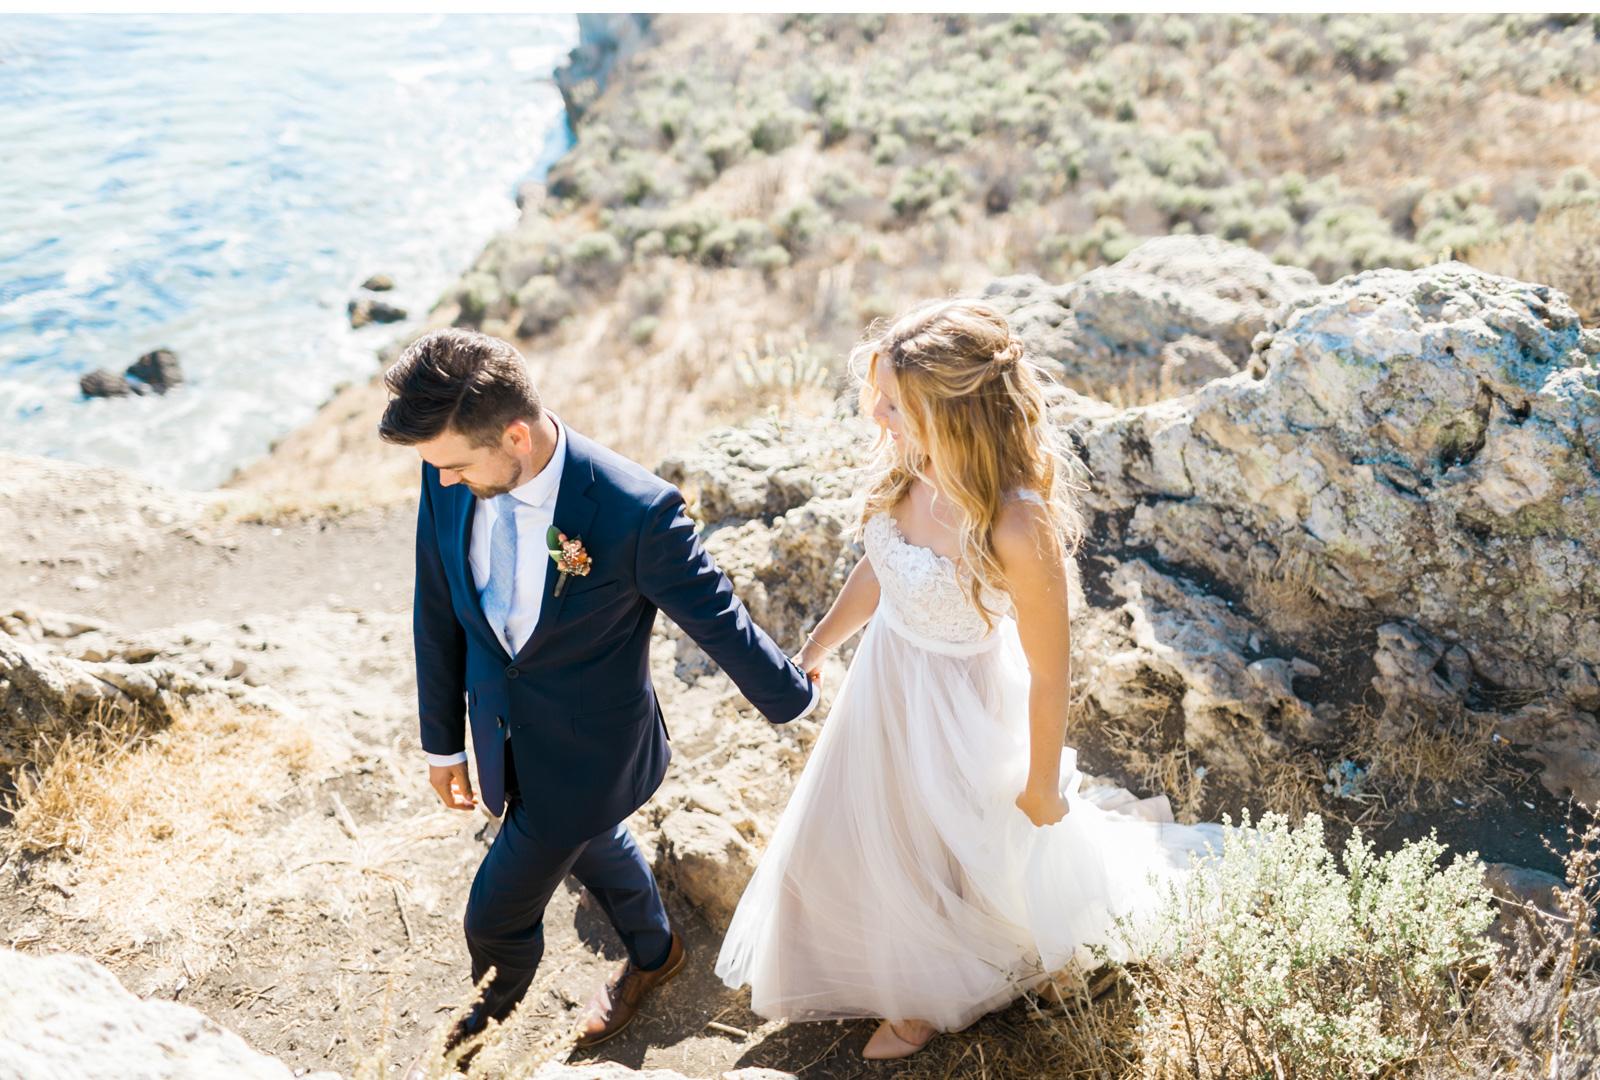 Avila-Beach-Wedding-Style-Me-Pretty-Natalie-Schutt-Photography_19.jpg